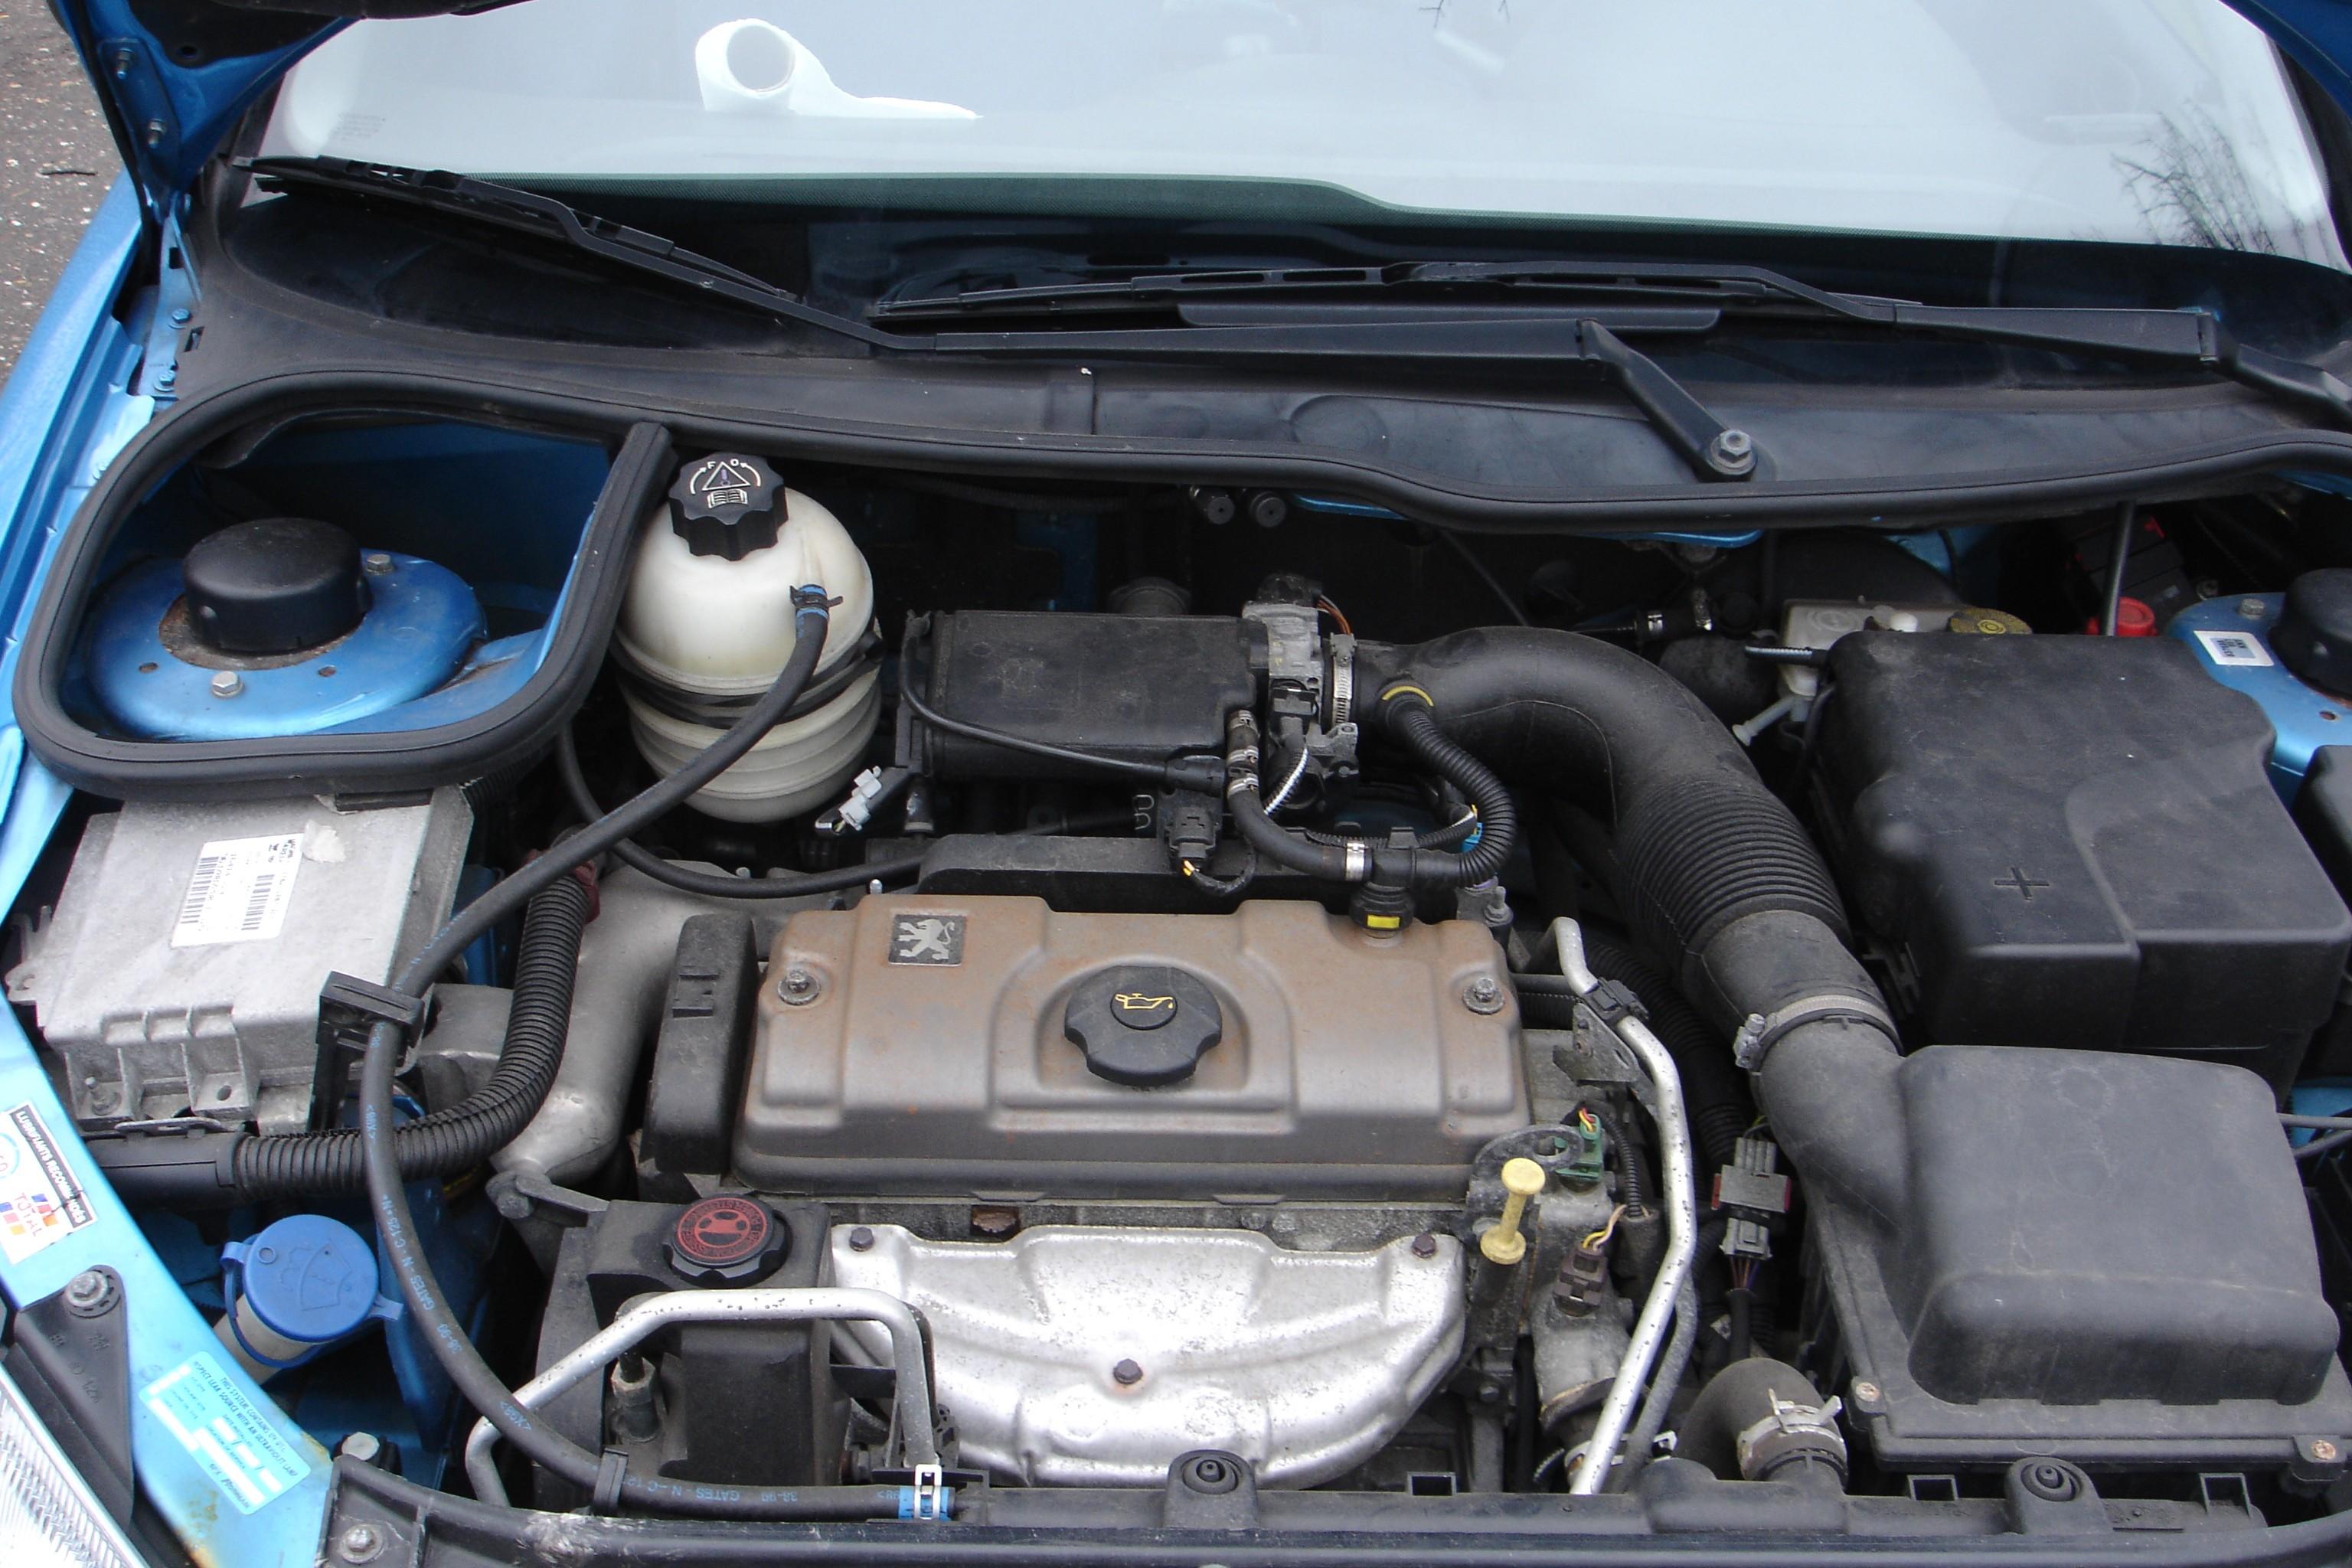 Peugeot 206 Engine Diagram File Peugeot 206 1999 Hatchback 1 1 Tu1jp Hfz 10 Jpg Wikimedia Of Peugeot 206 Engine Diagram